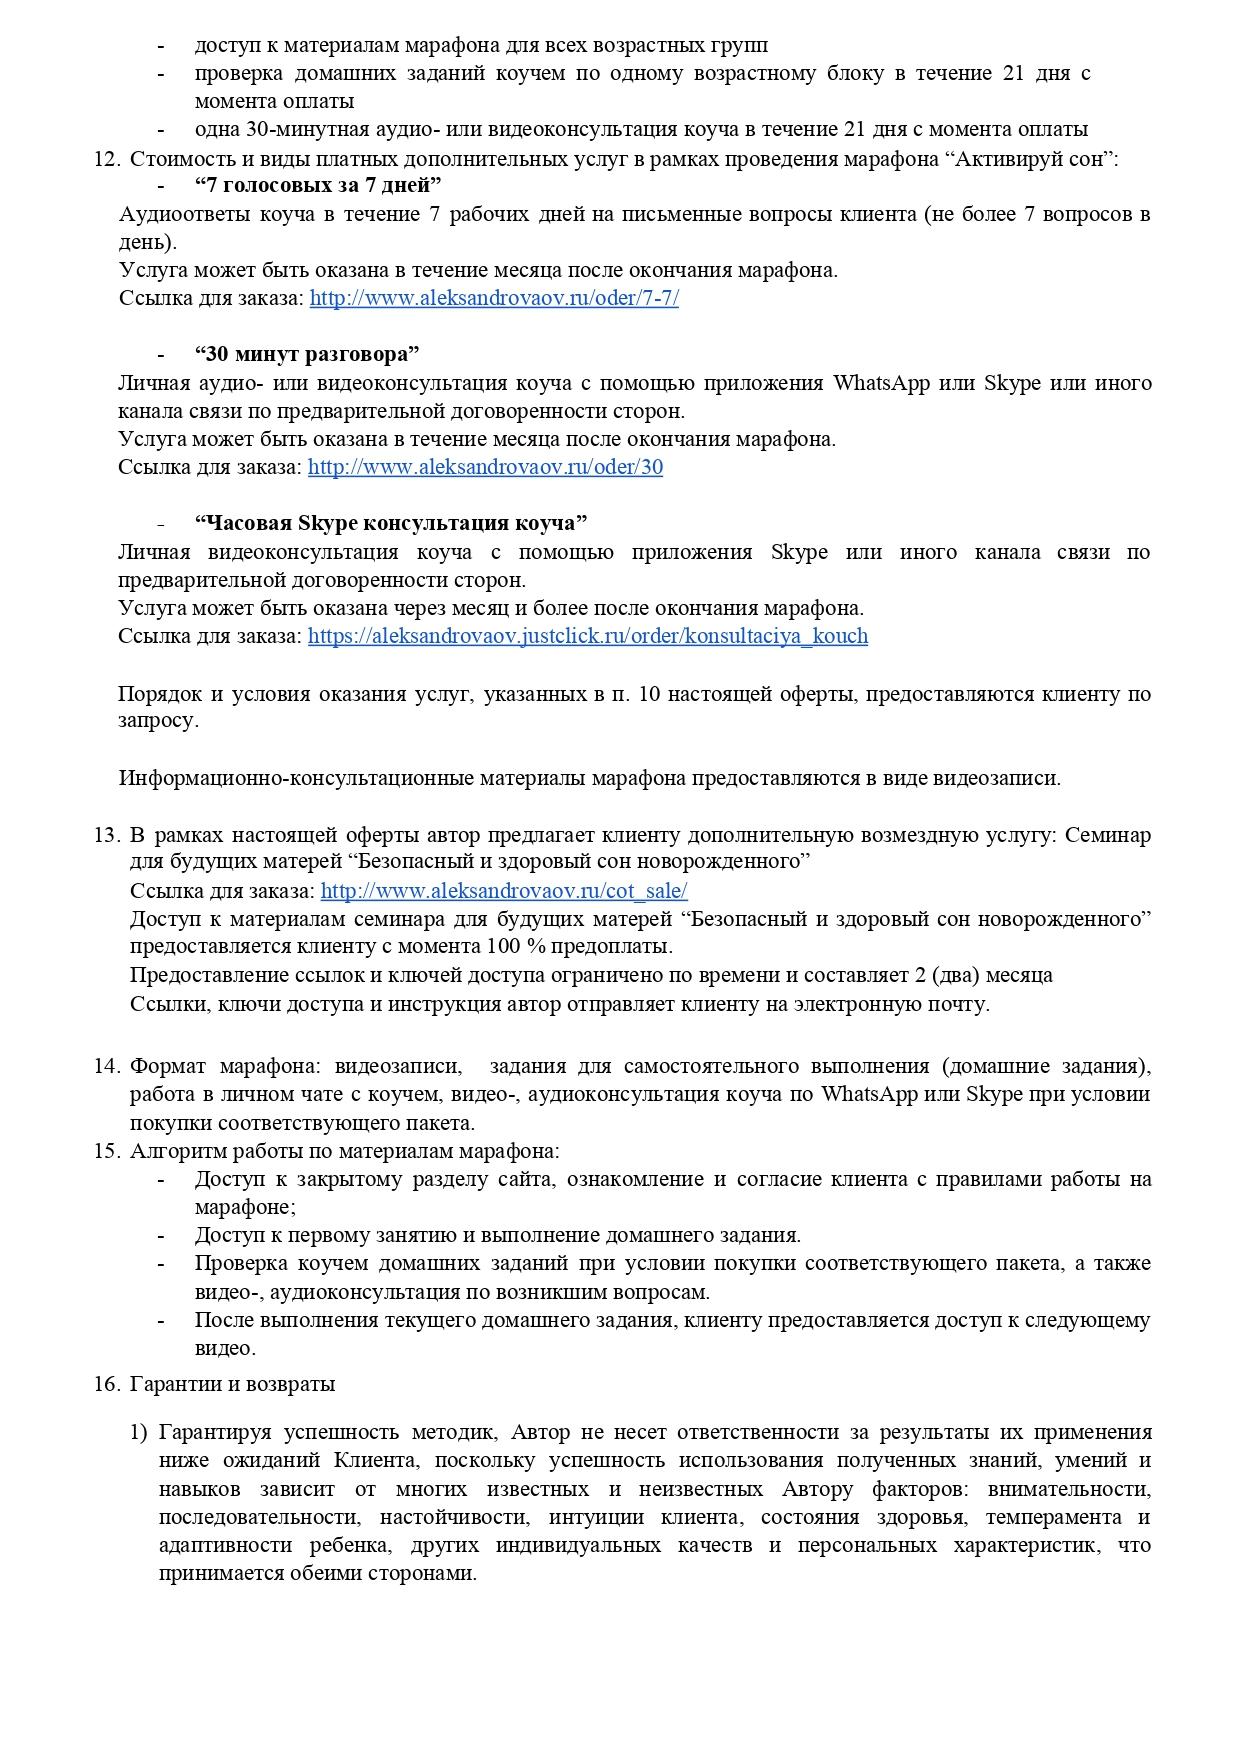 https://www.aleksandrovaov.ru/wp-content/uploads/2019/10/oferta-2.jpg